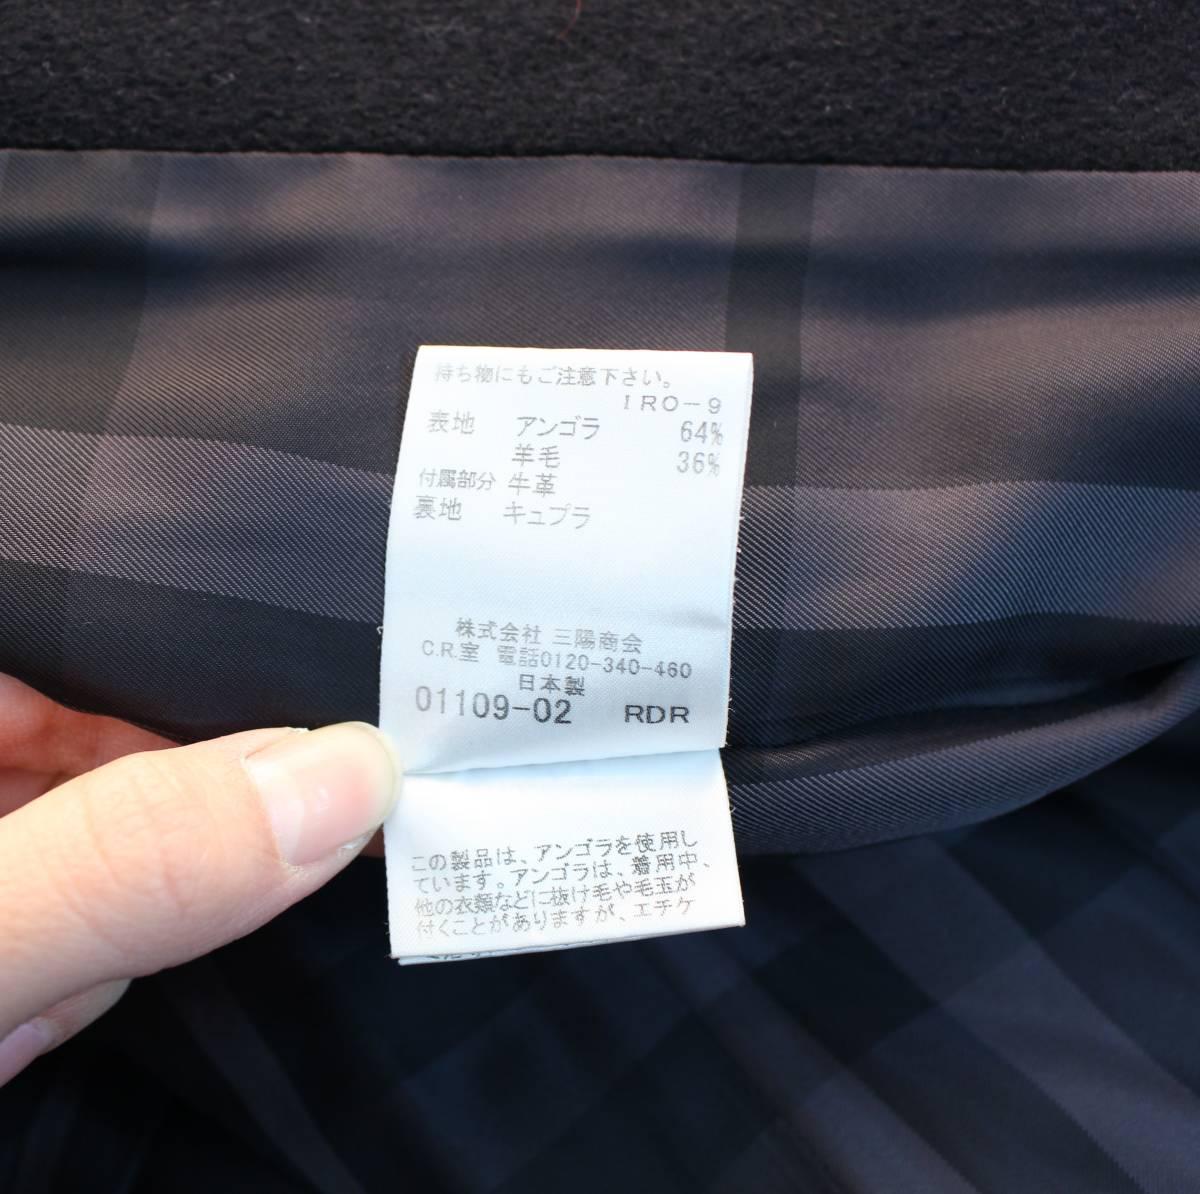 BURBERRY LONDON ANGORA BREND WOOL BELTED COAT MADE IN JAPAN/バーバリーロンドンアンゴラ混ウールベルテッドコート_画像8